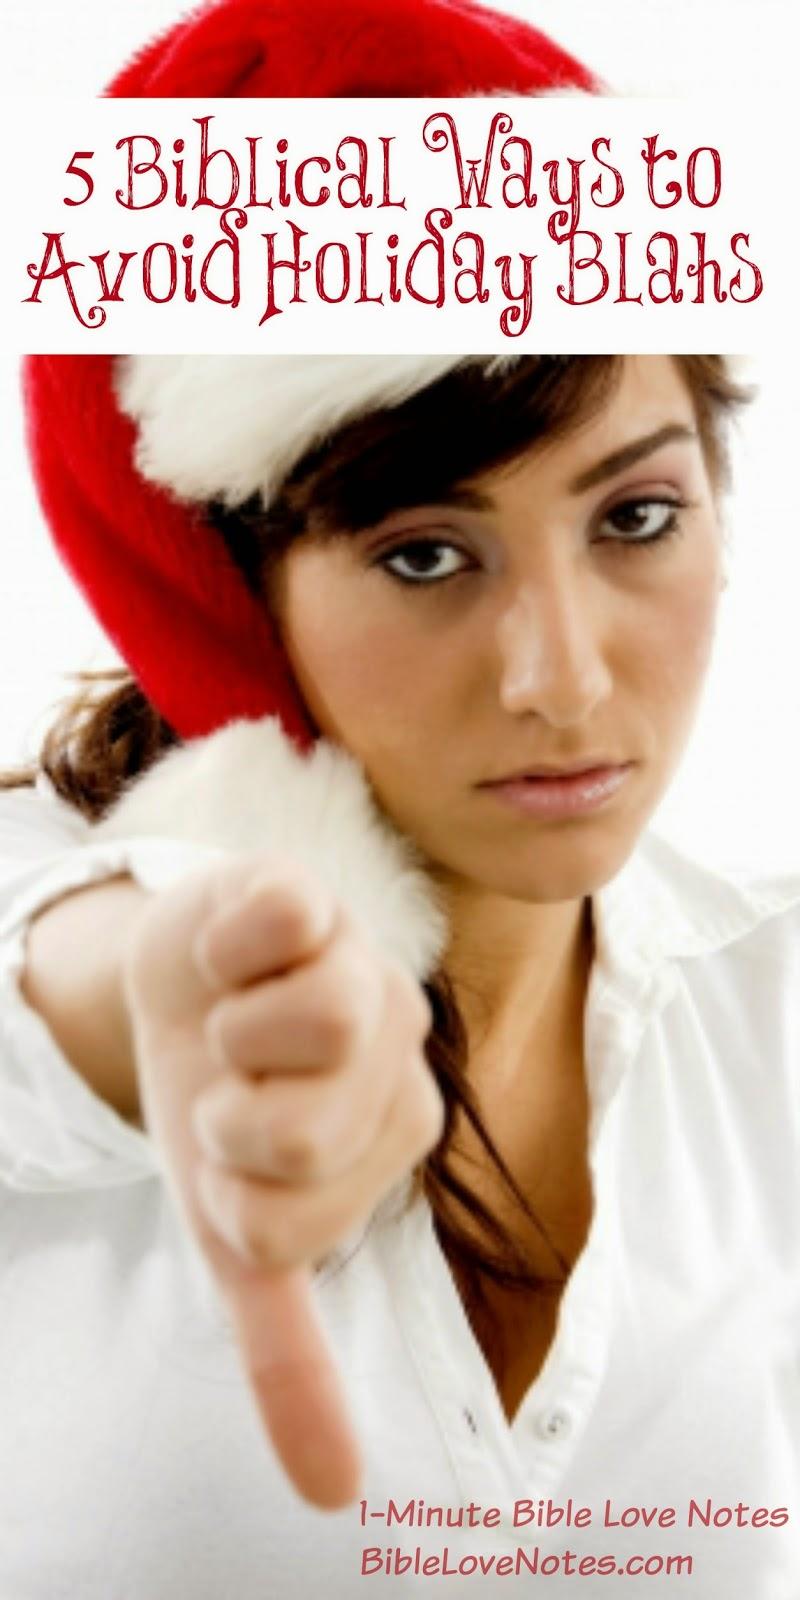 holiday blahs, avoiding depression at Christmas, Biblical ways to avoid blahs